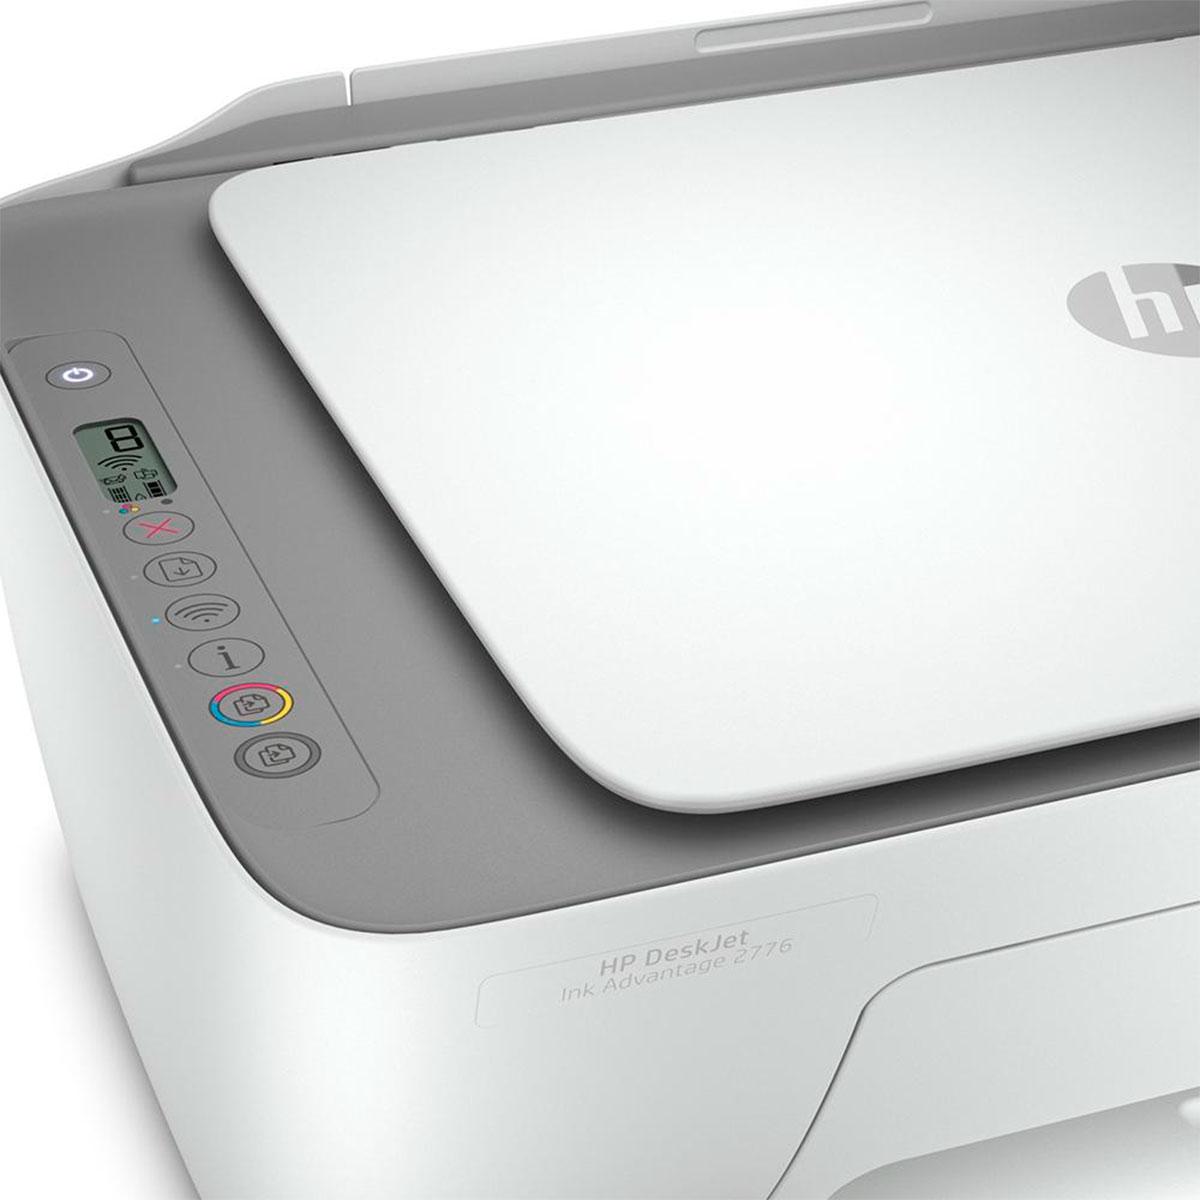 Impressora Multifuncional HP Deskjet Ink Advantage 2776 Colorida Wi-Fi Bivolt - 7FR20A